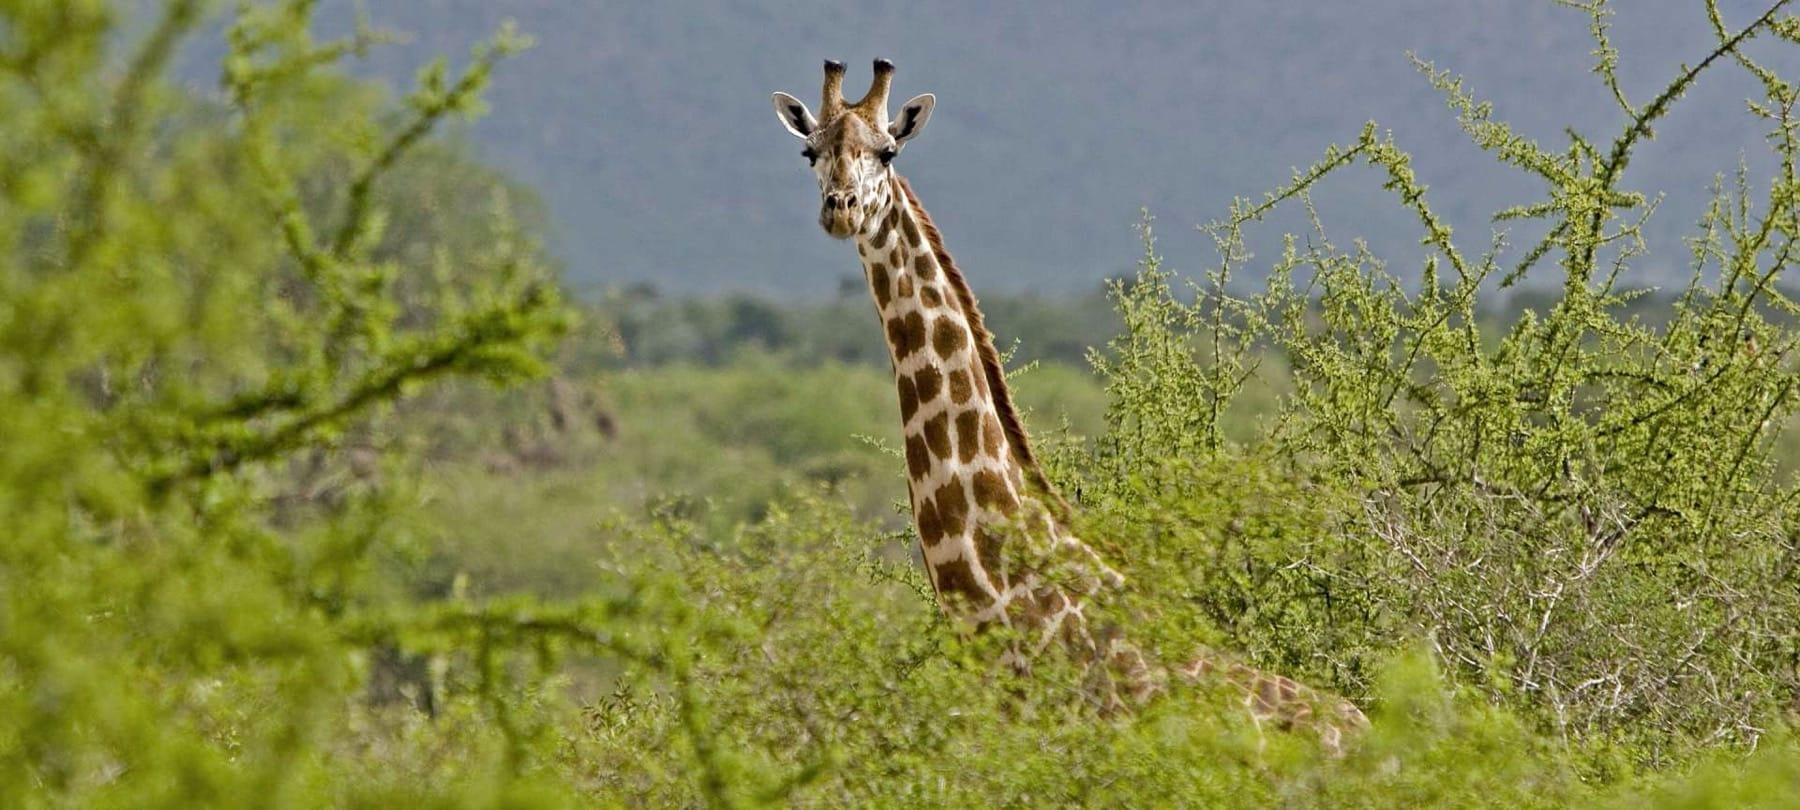 Giraffe_Tsavo East_Kenya